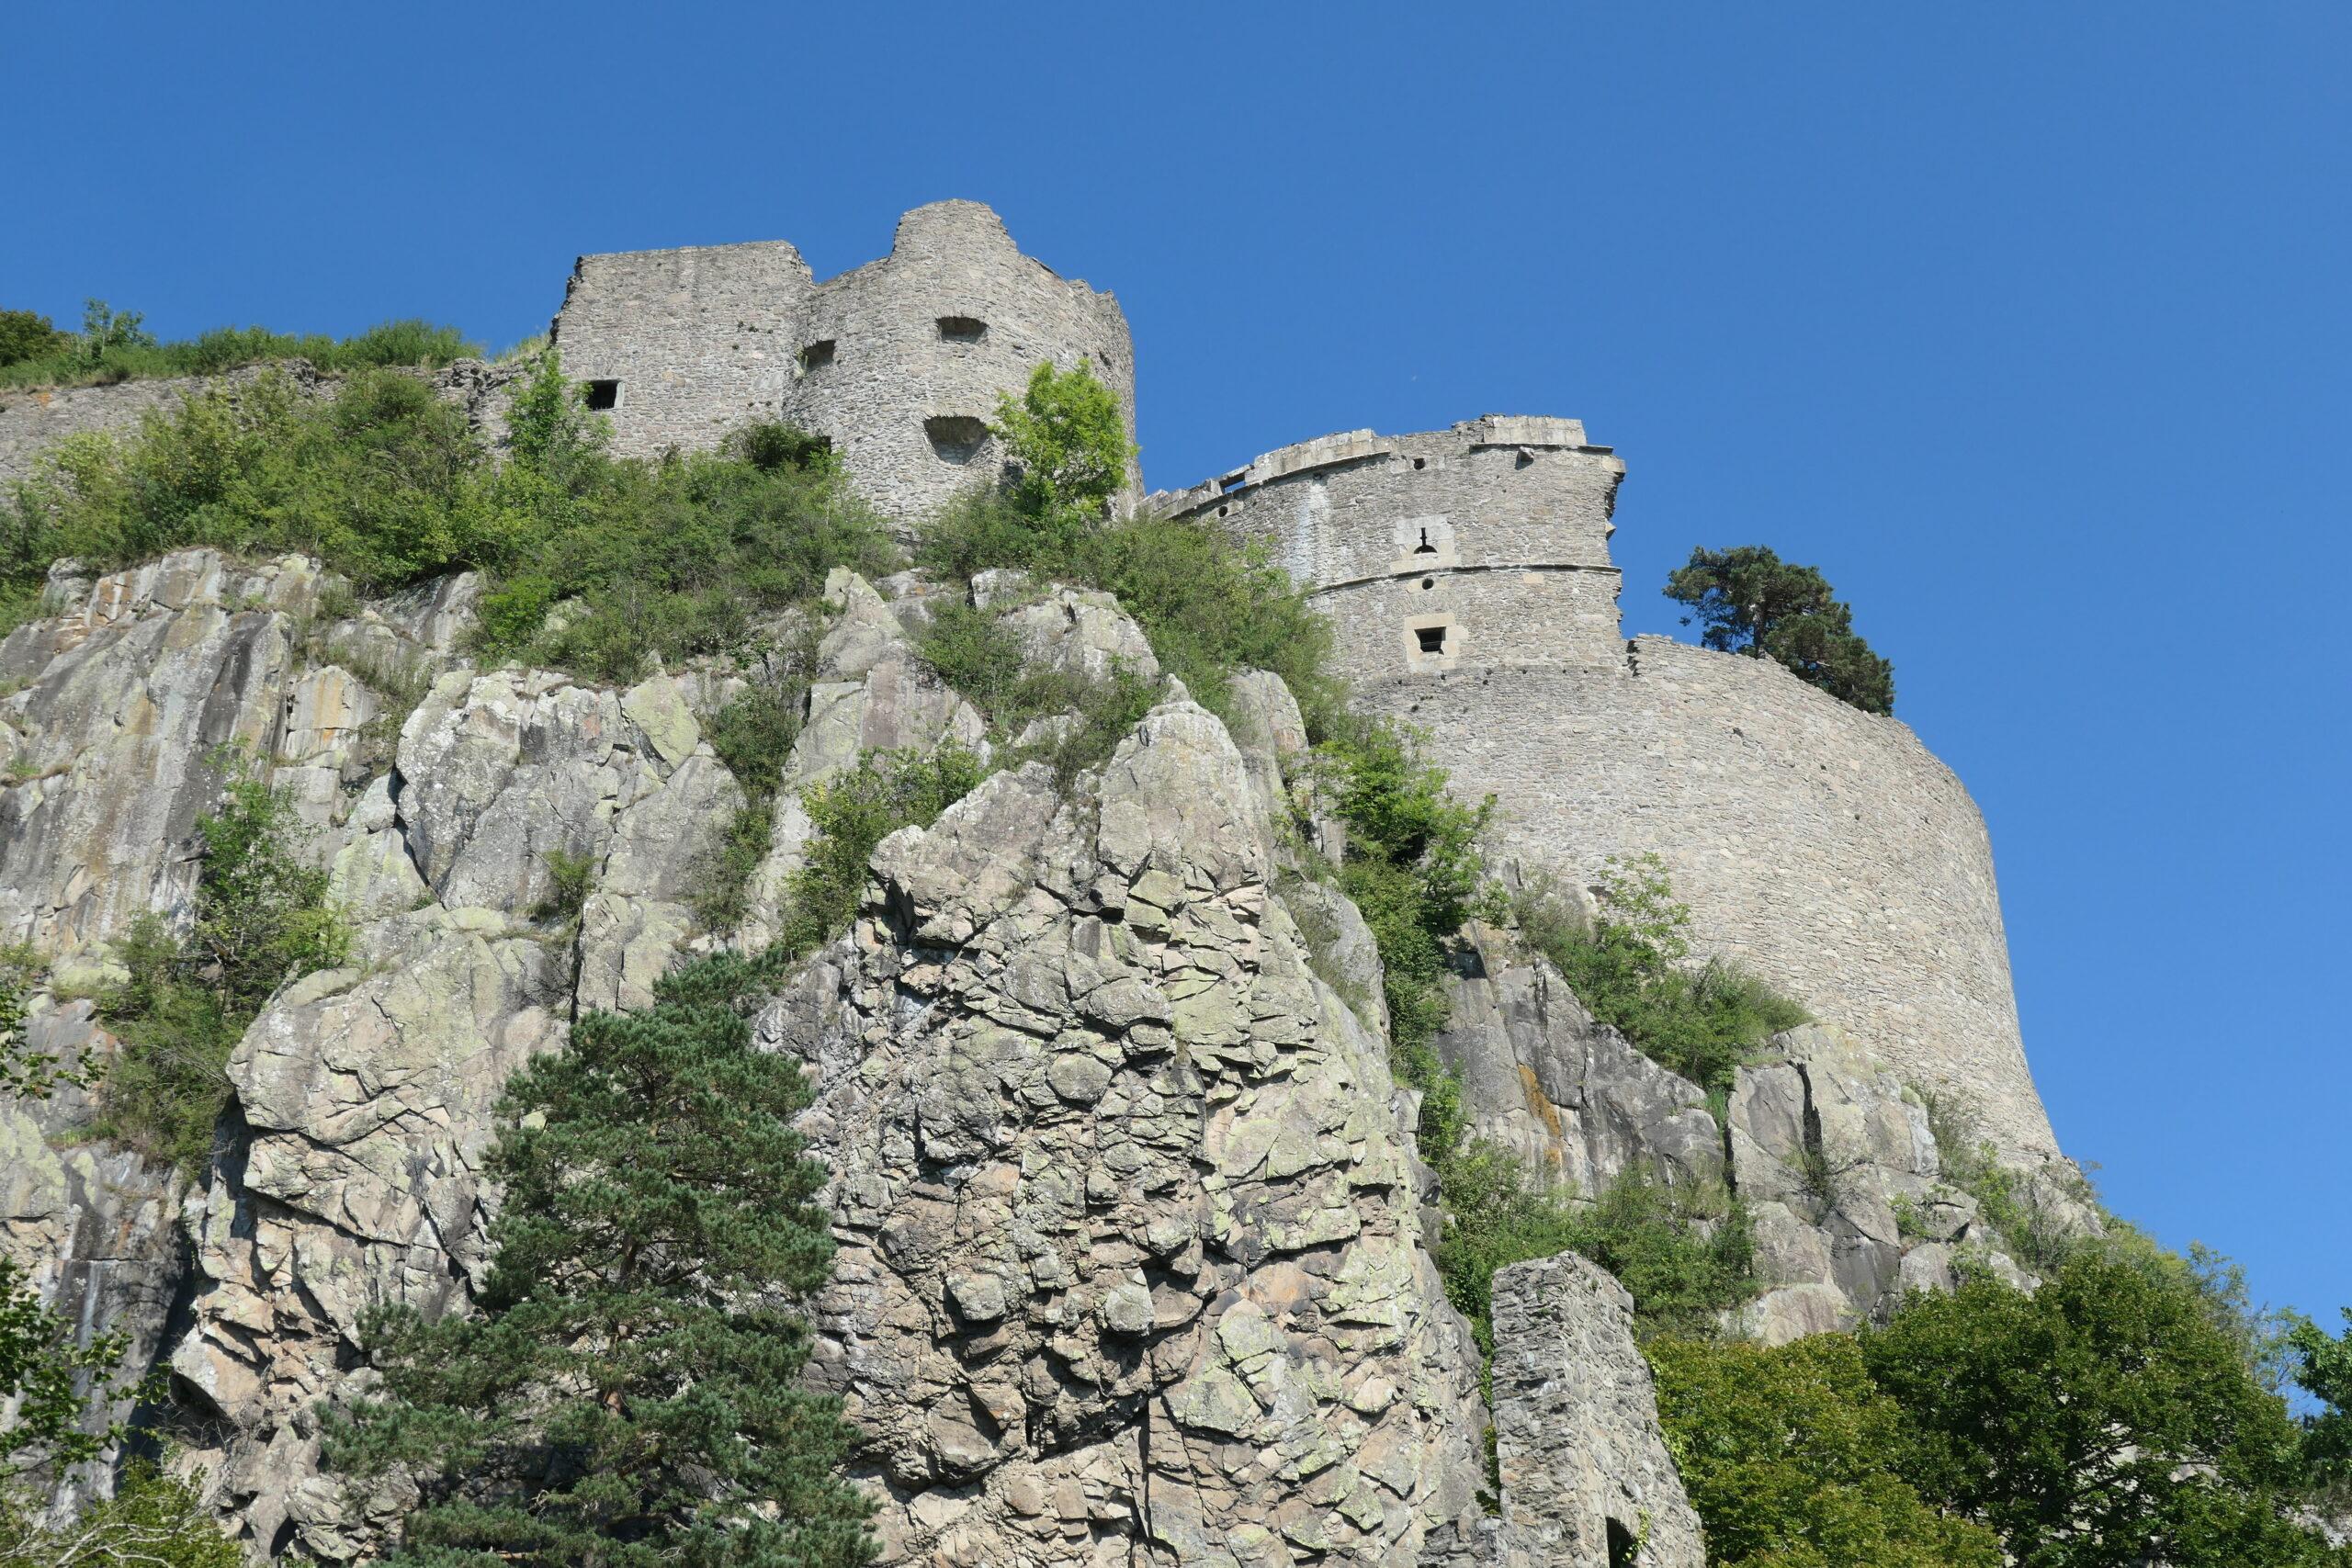 The massive ruins of castle hohentwiel